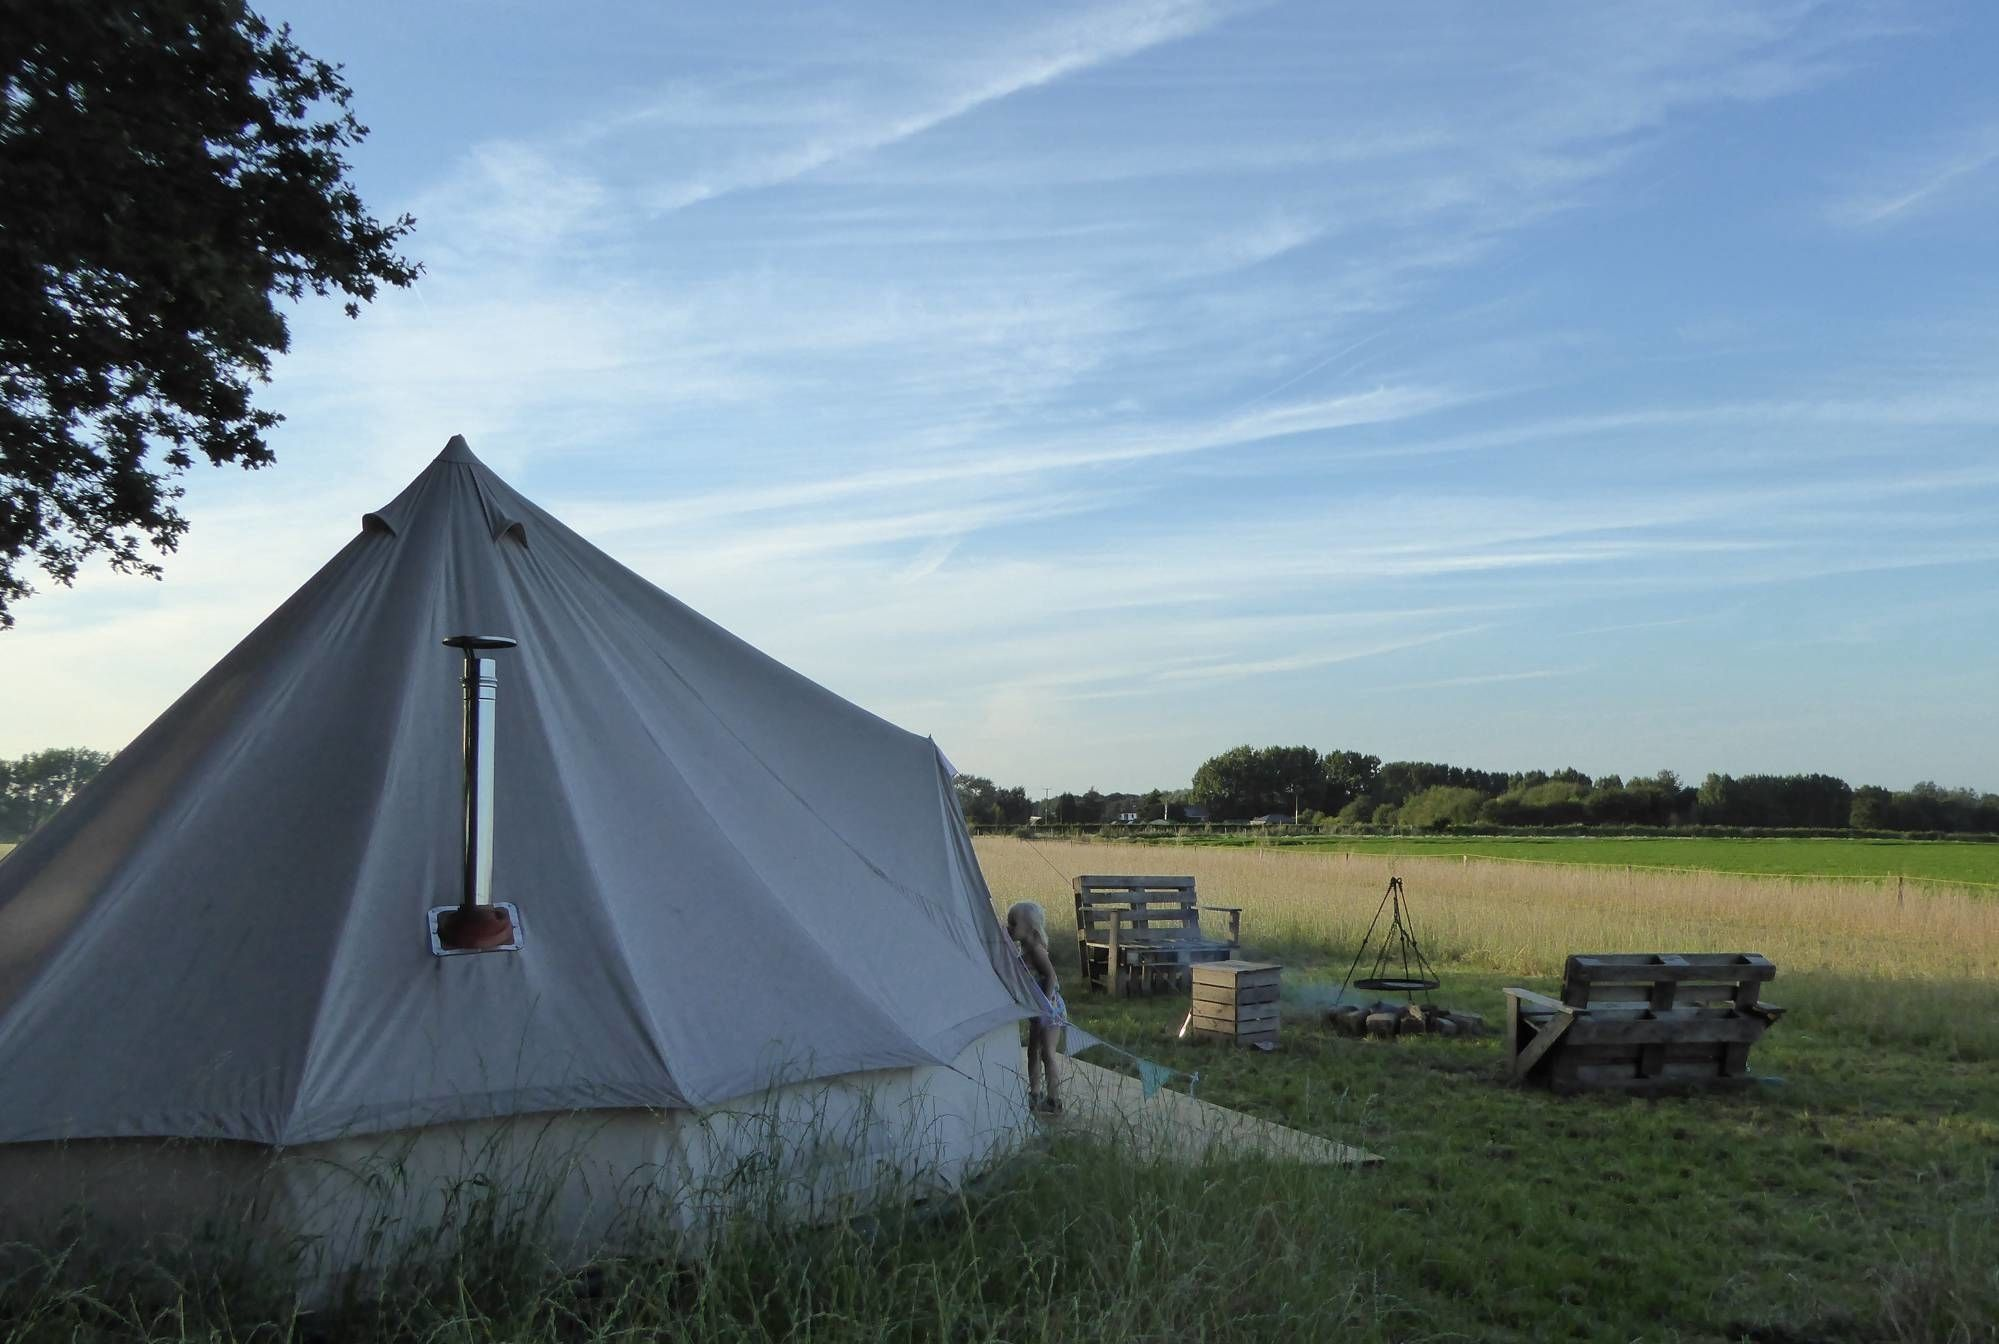 Campsites in England